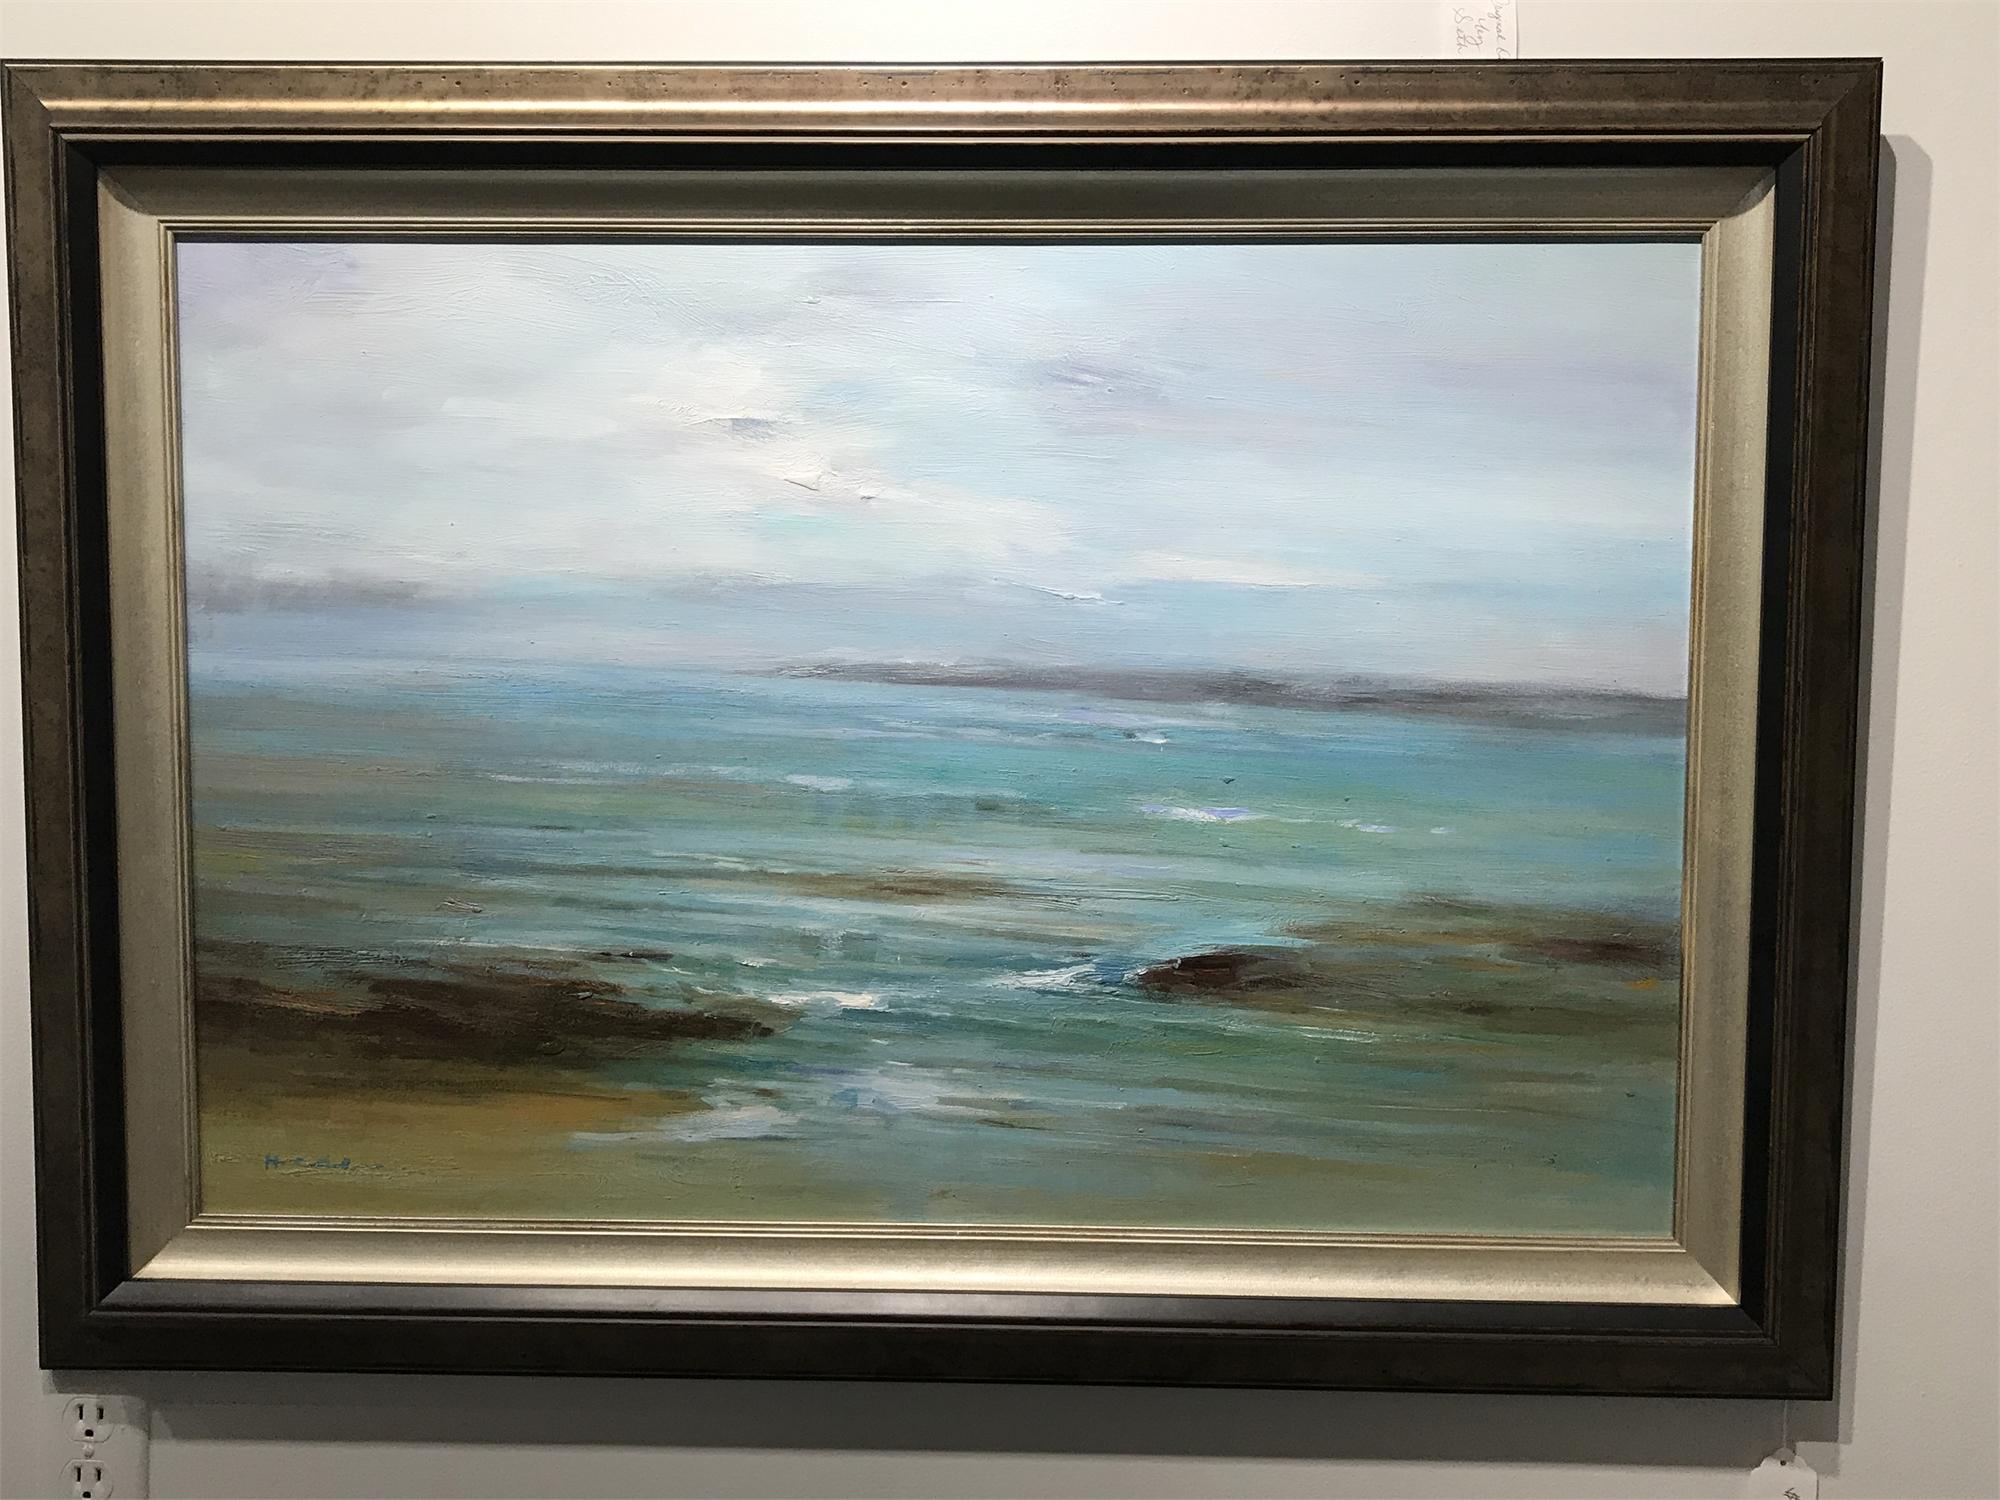 BEACH SCENE by H. CAVENDER